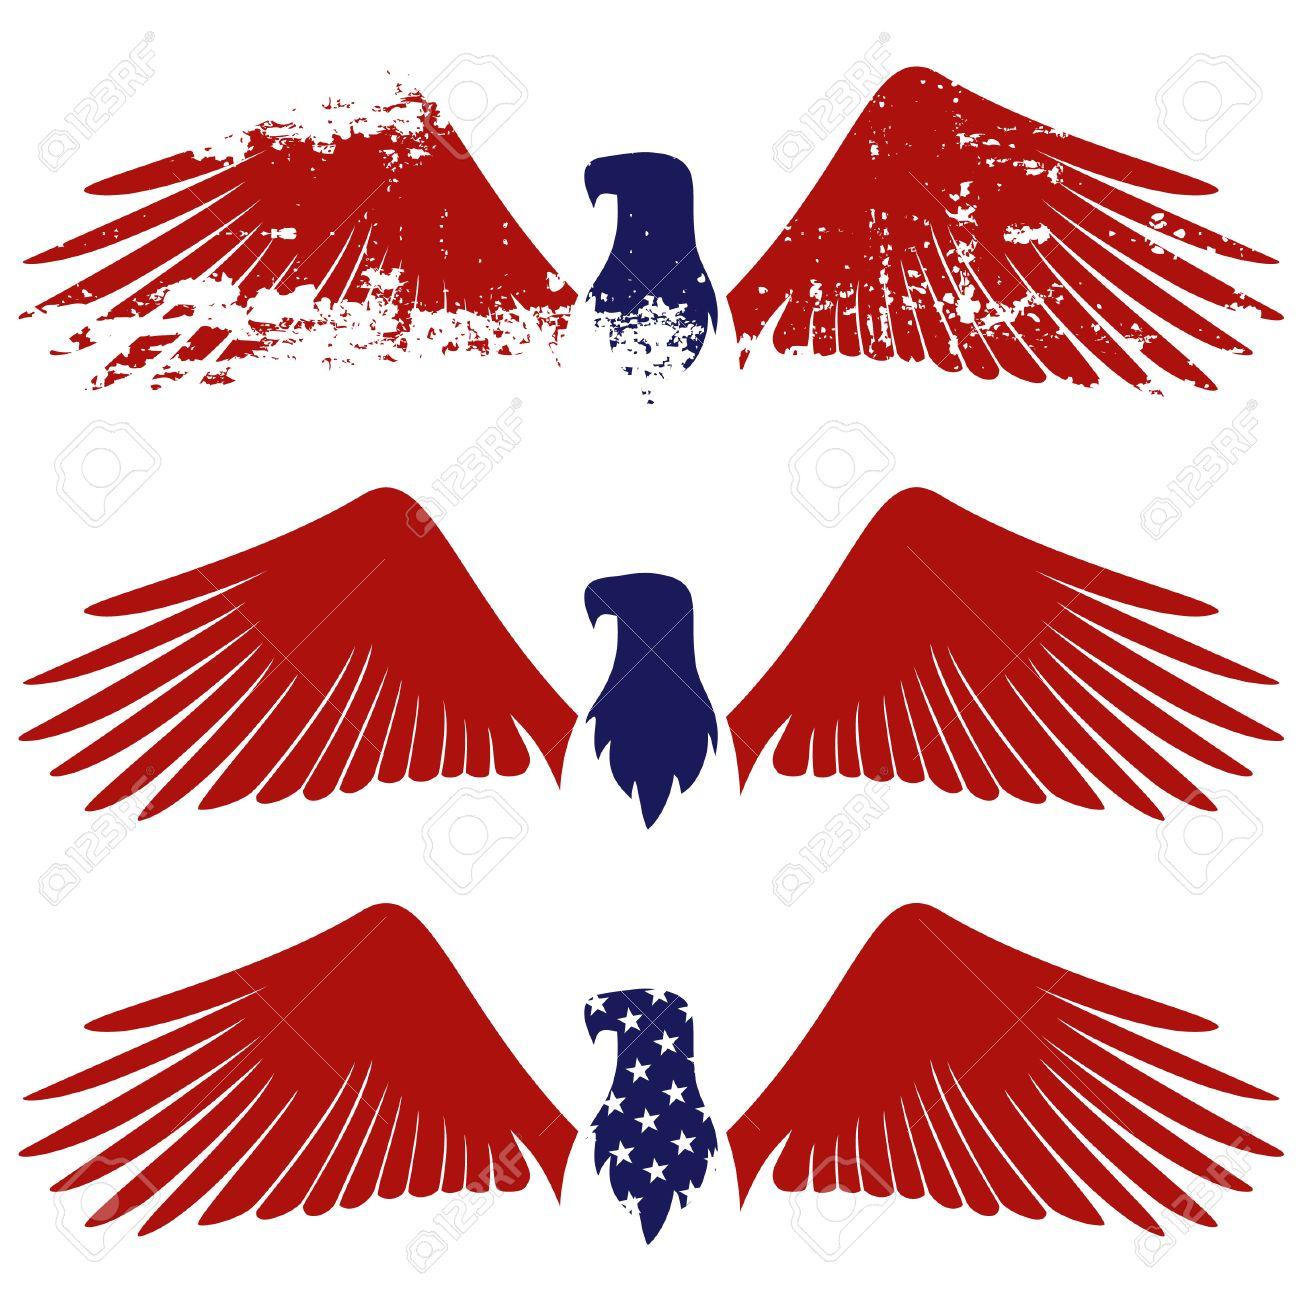 American Eagle Symbol Royalty Free Cliparts Vectors And Stock